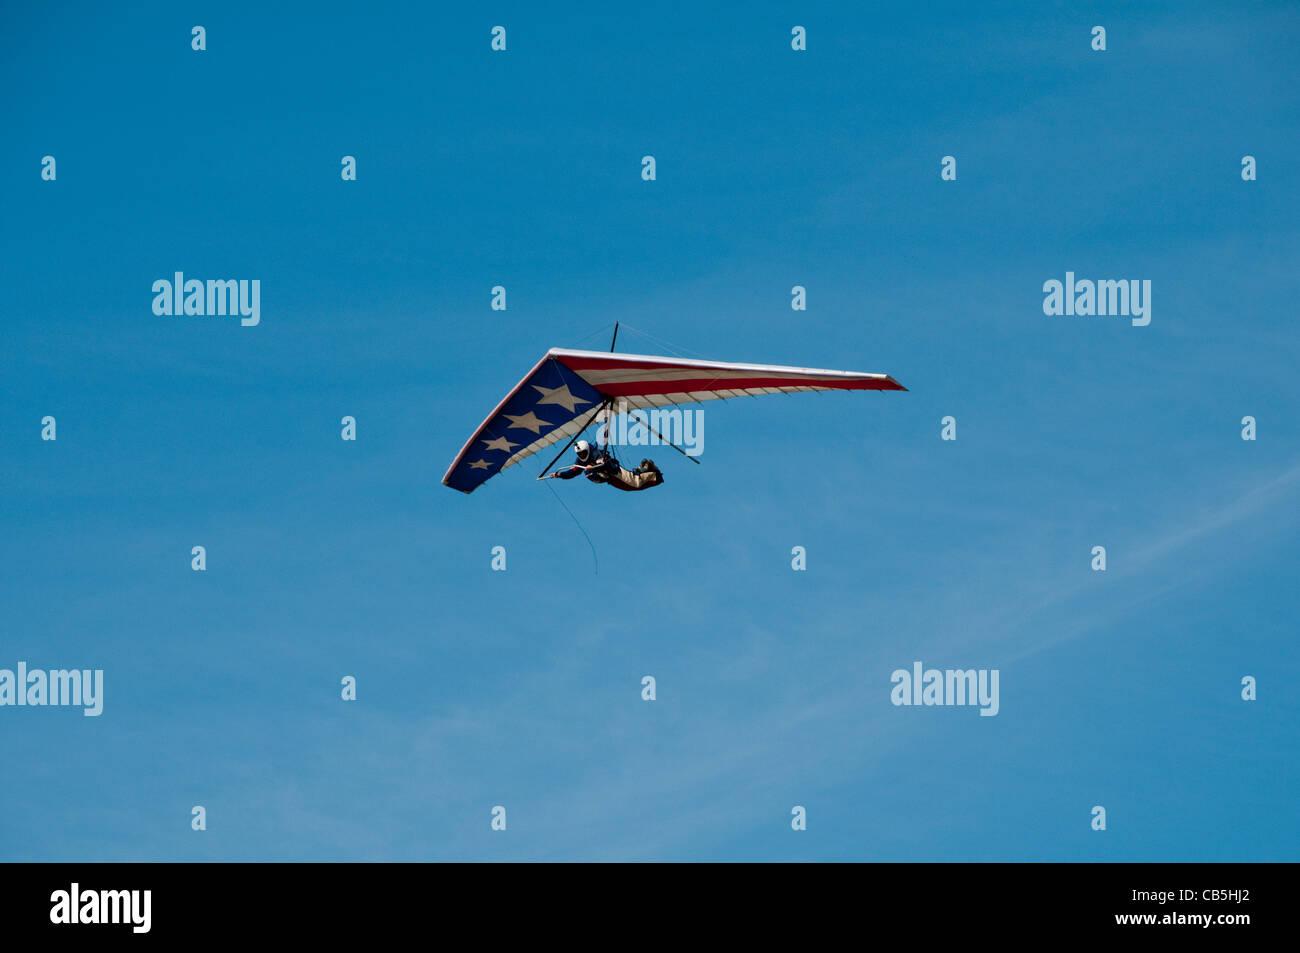 Hang gliding, hang glider, Fort Funston, San Francisco, California, USA. Photo copyright Lee Foster. Photo # california108423 - Stock Image